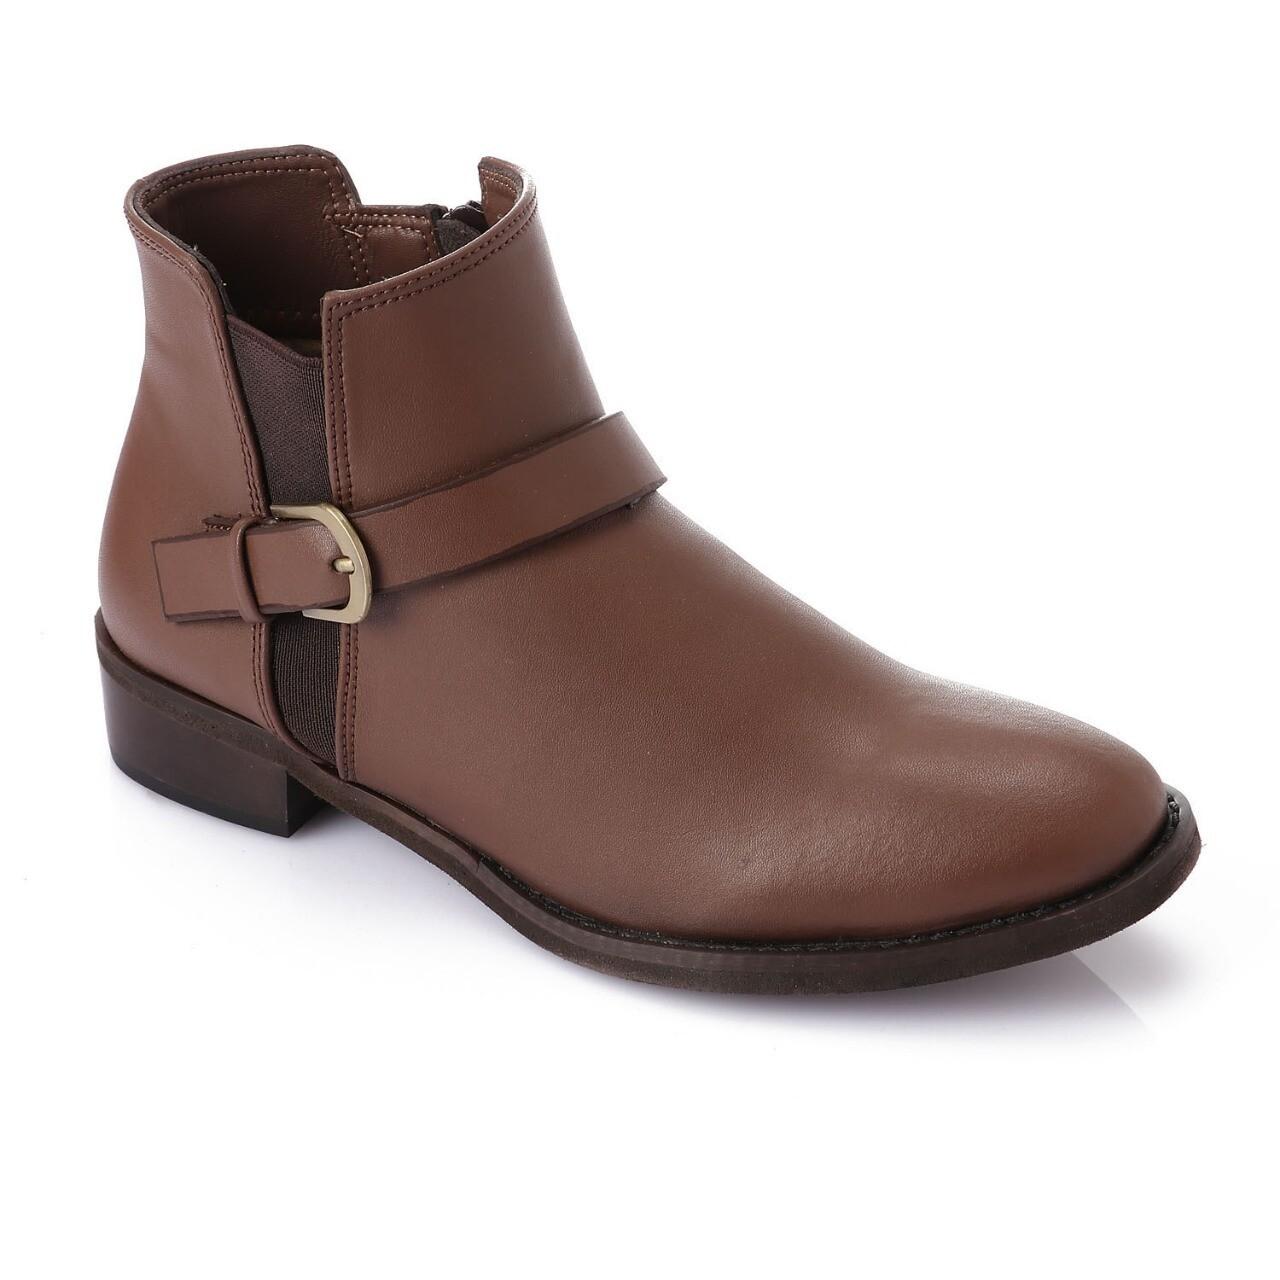 3741 Half Boot - Brown